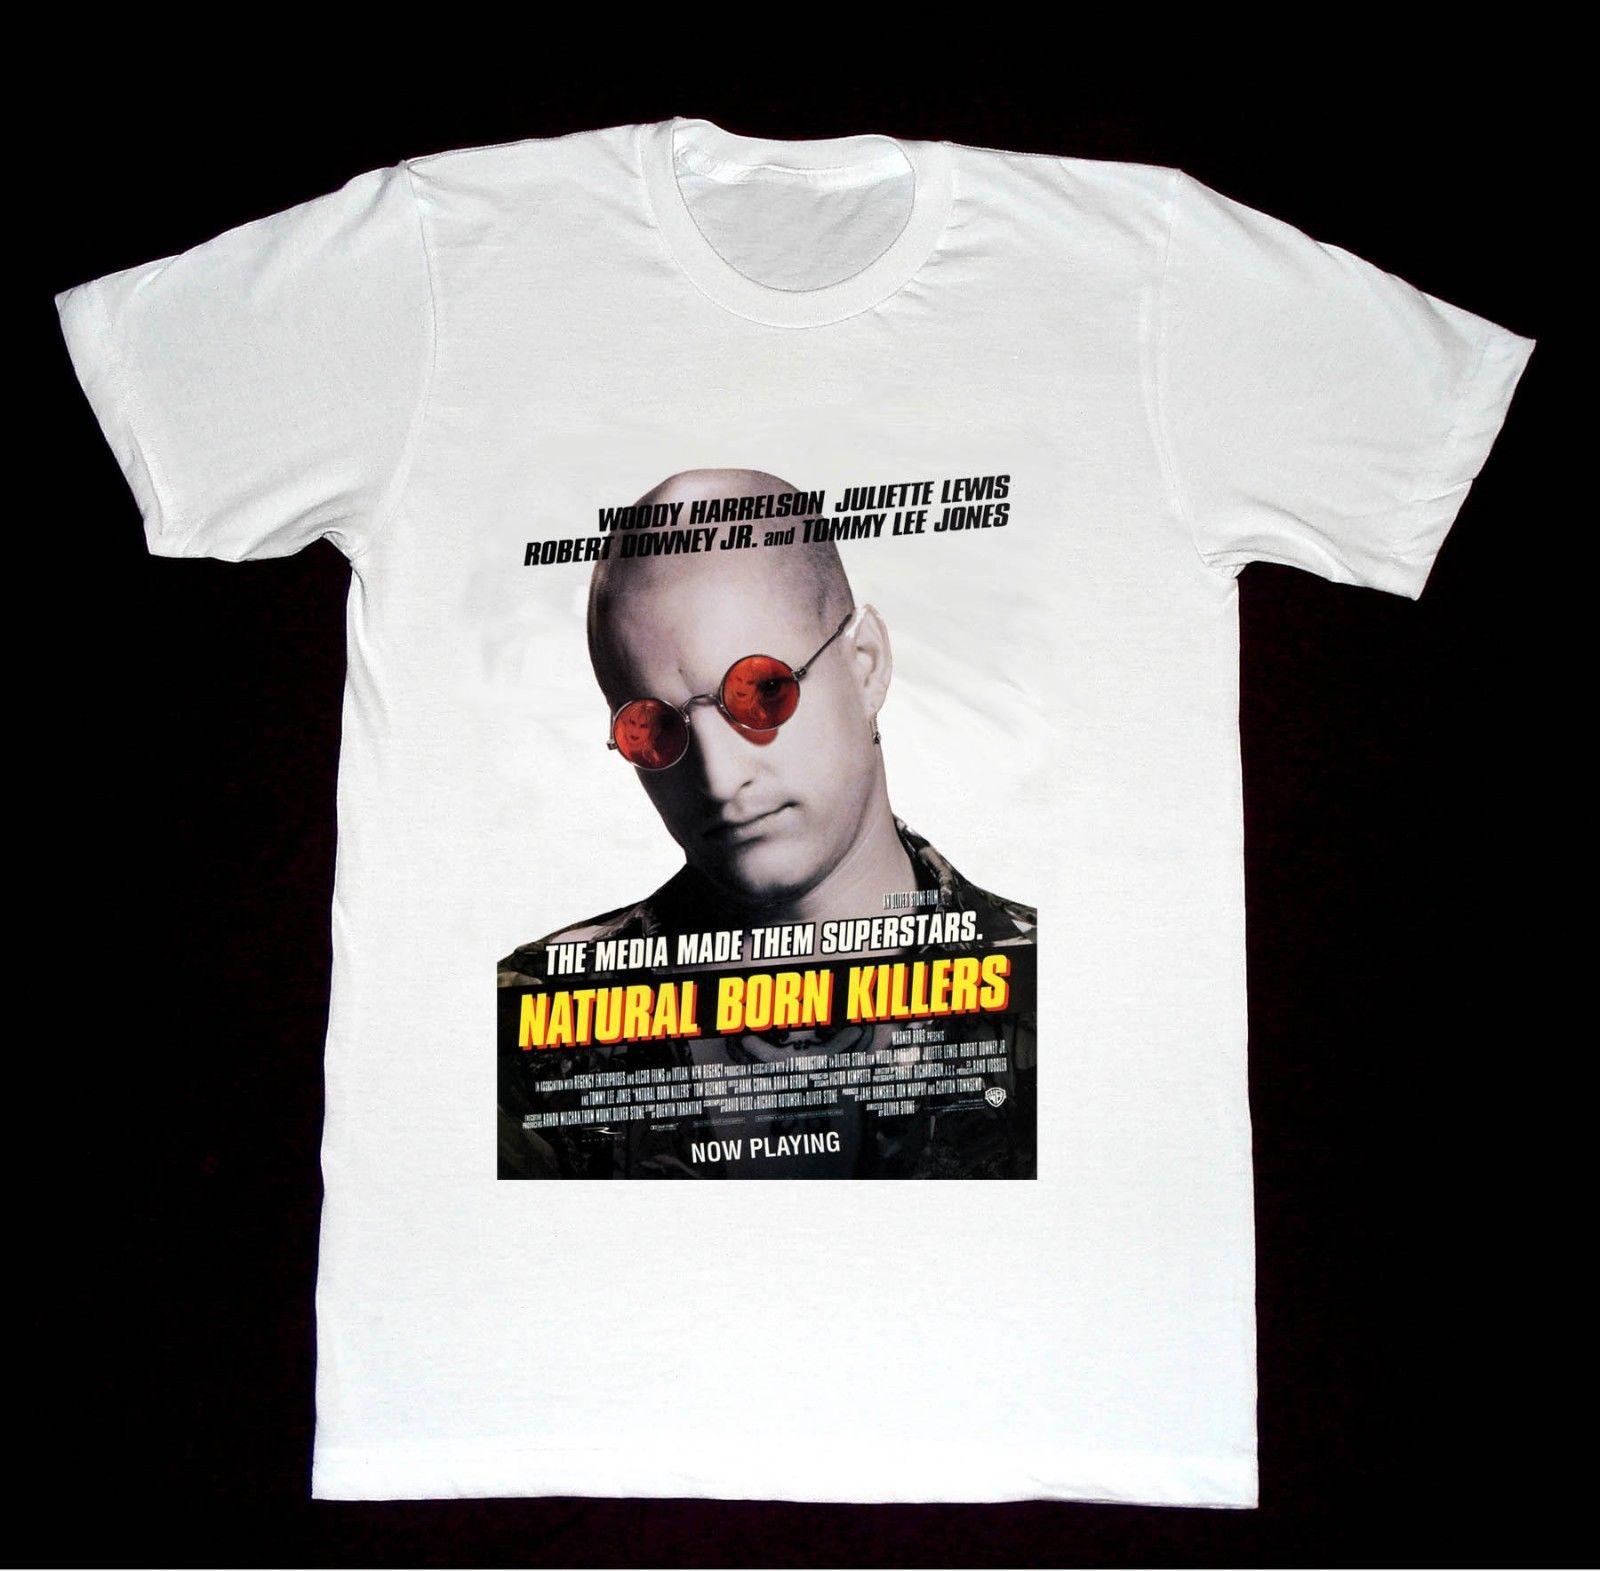 natural-born-killers-t-shirt-oliver-stone-font-b-tarantino-b-font-cult-film-t-shirt-fashiont-shirt-free-shipping-top-tee